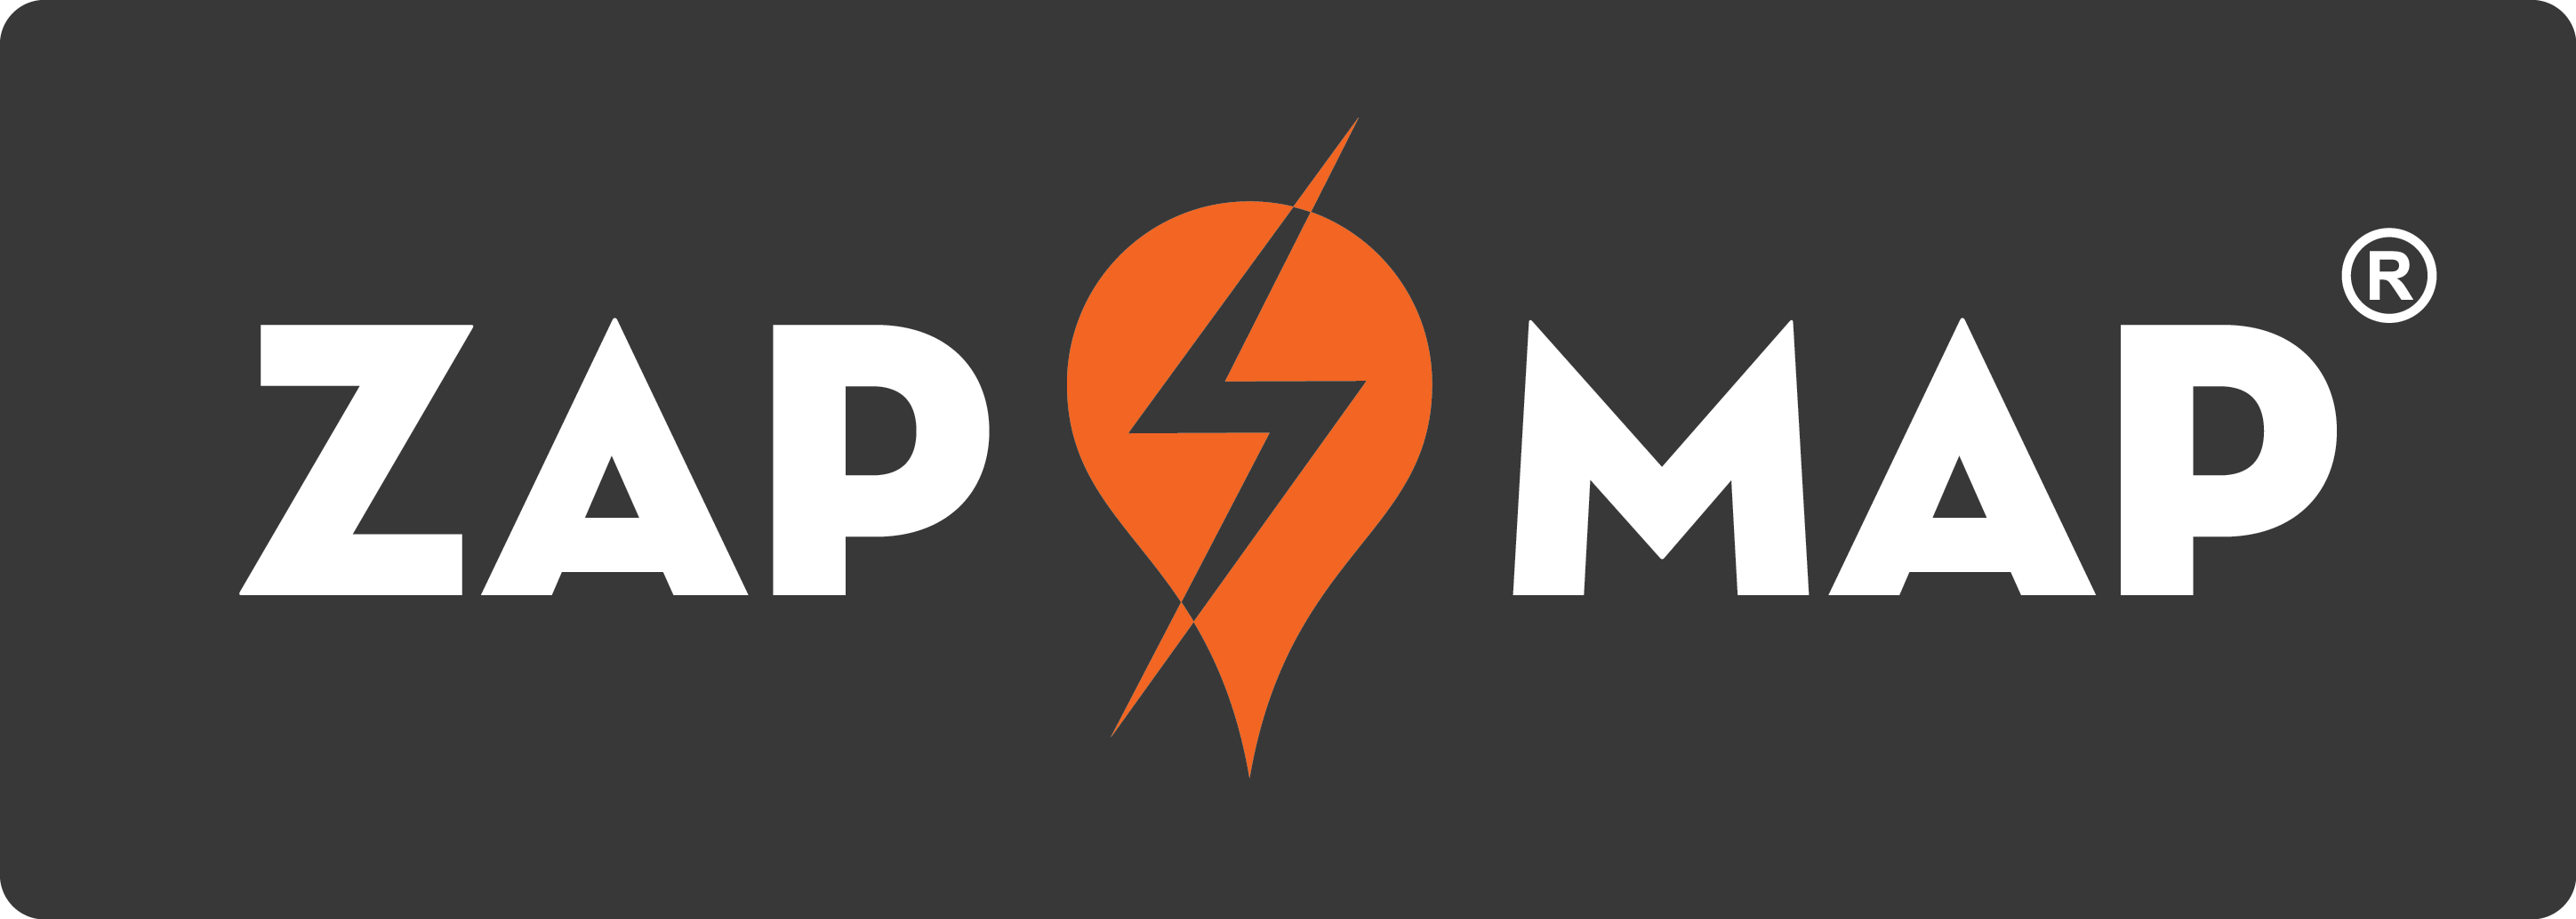 zap-map-nissan